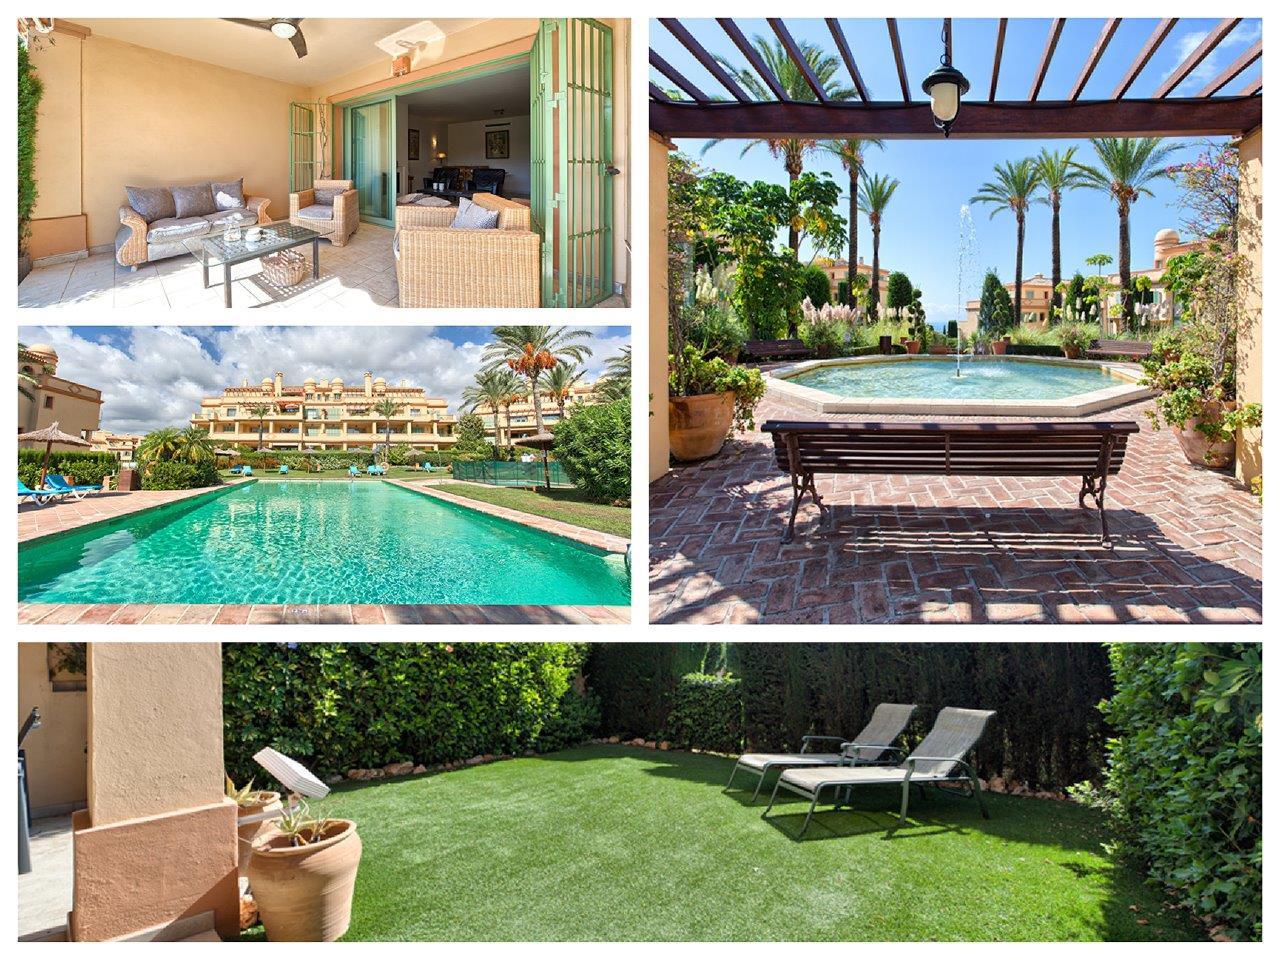 Apartment for sale in Four Seasons Los Flamingos Benahavis